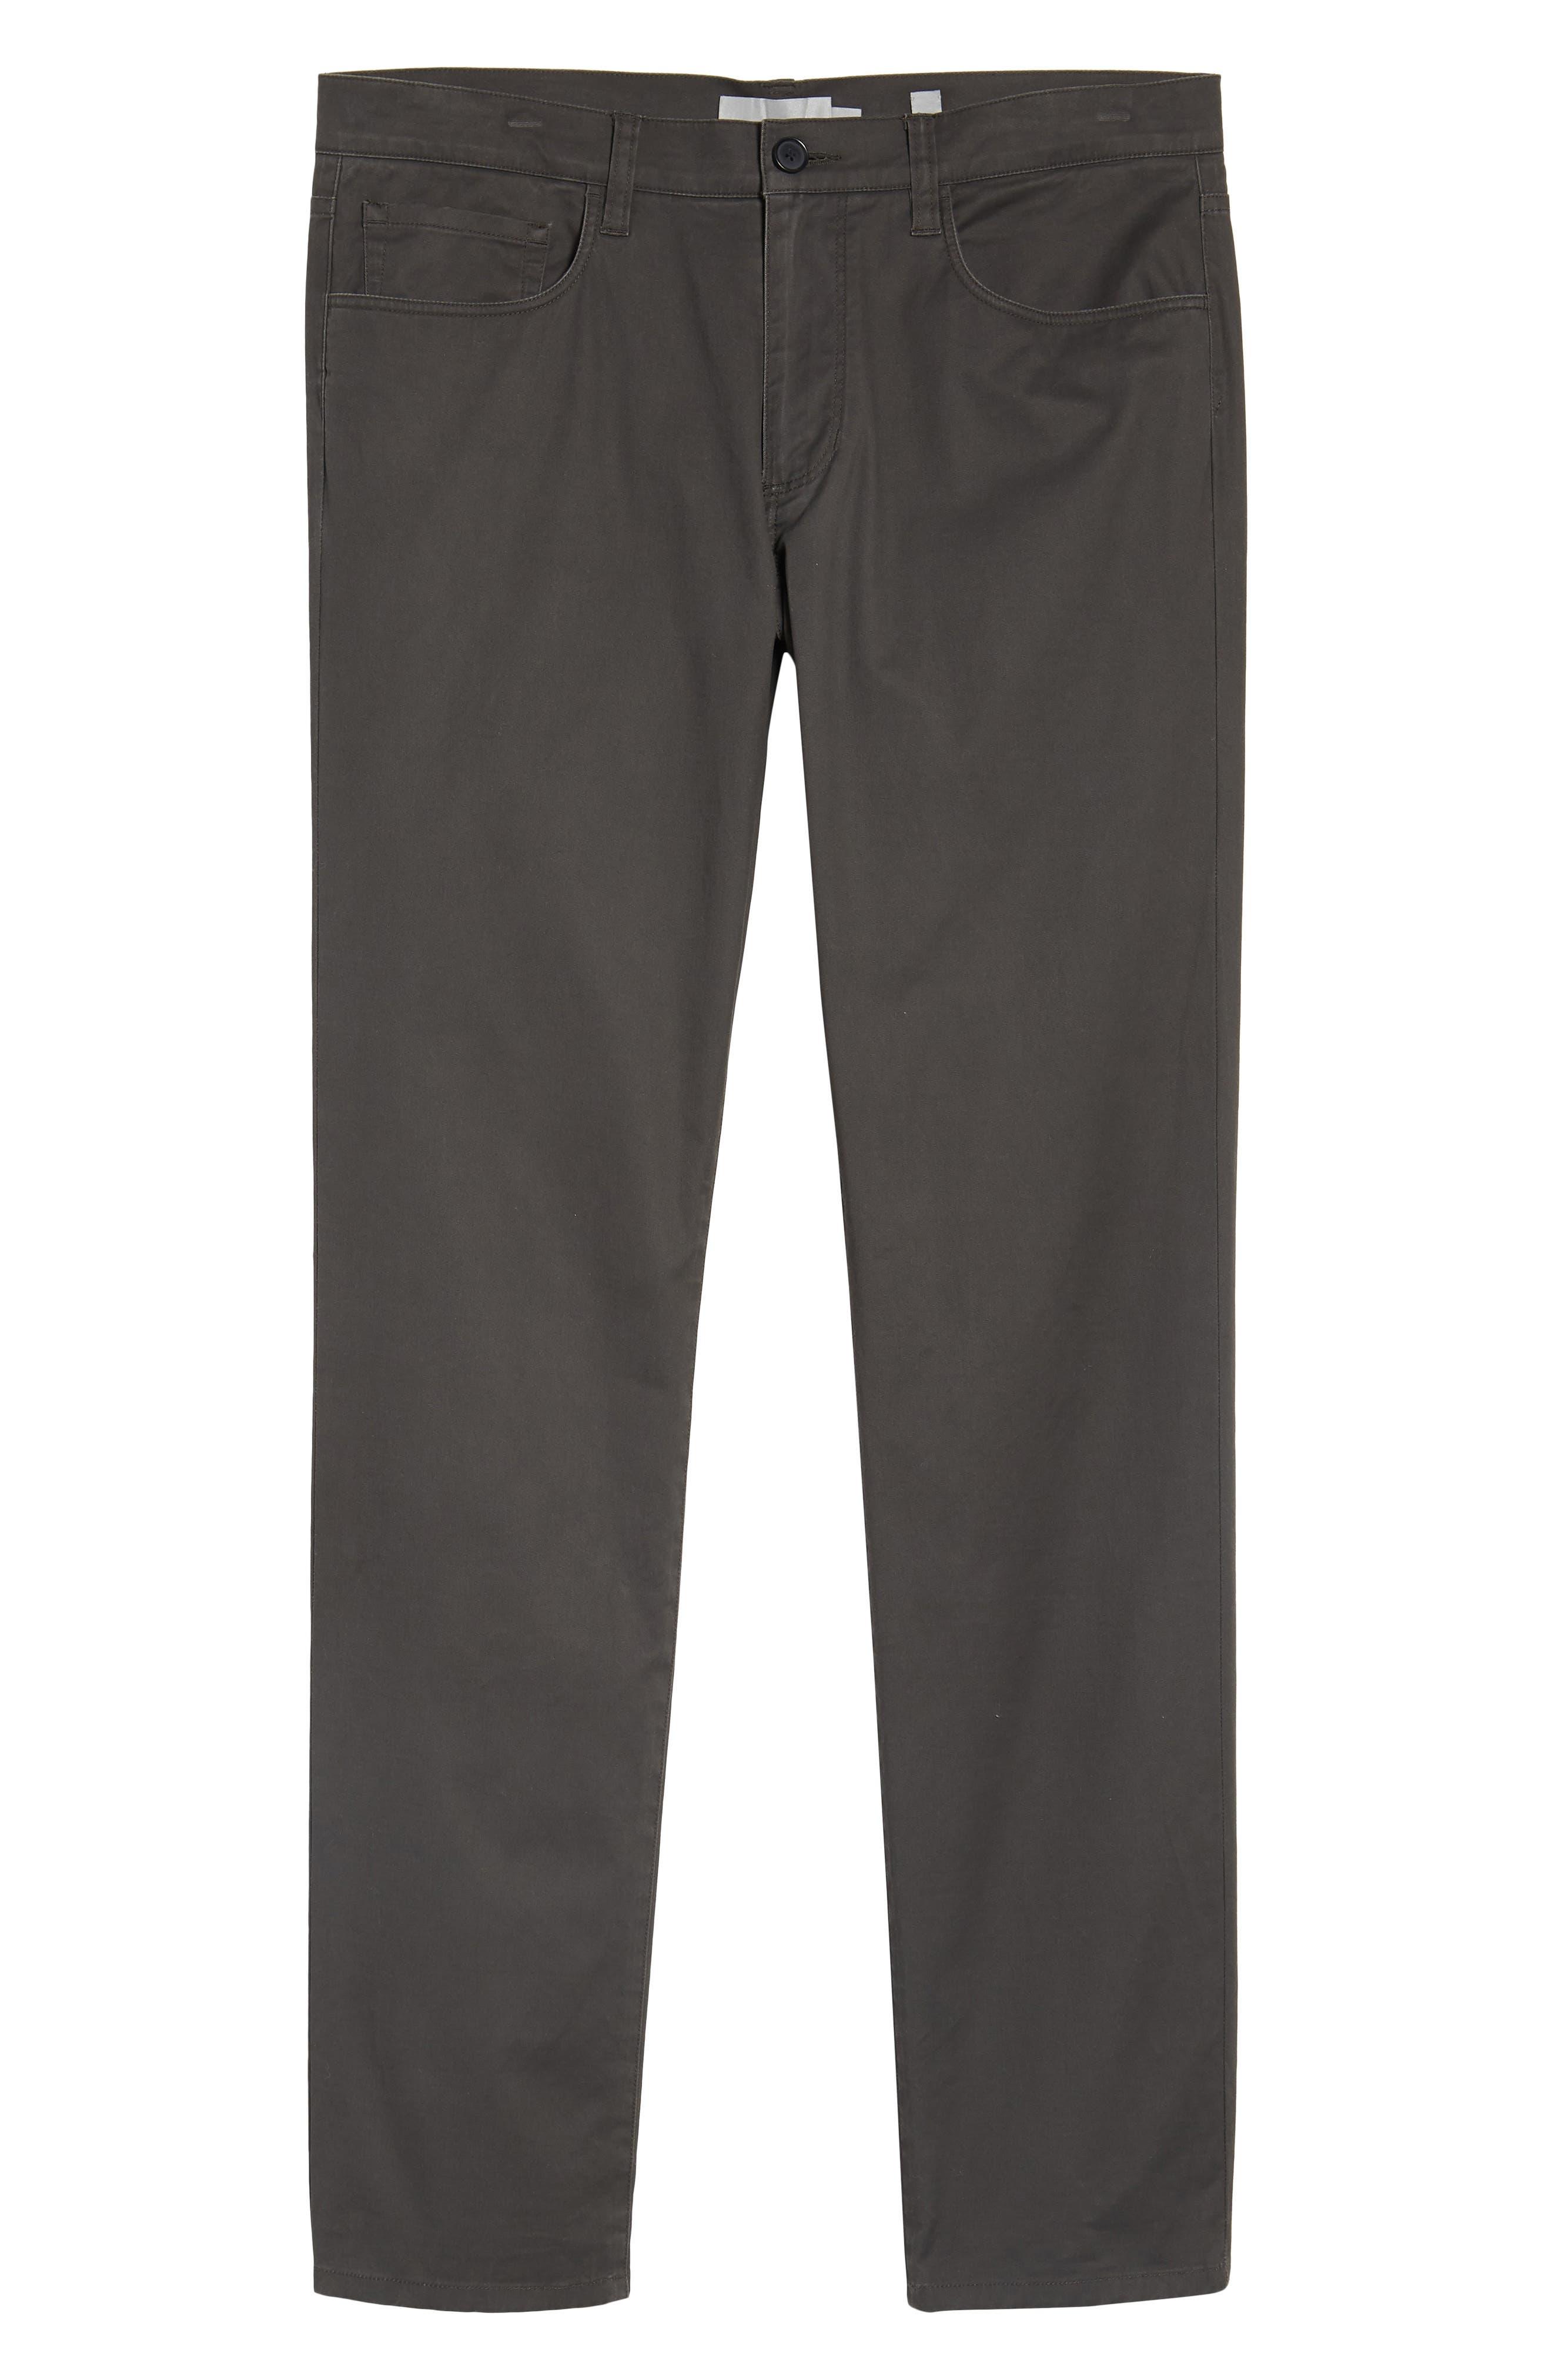 Slim Fit Wool Track Pants,                             Alternate thumbnail 6, color,                             Light Heather Grey